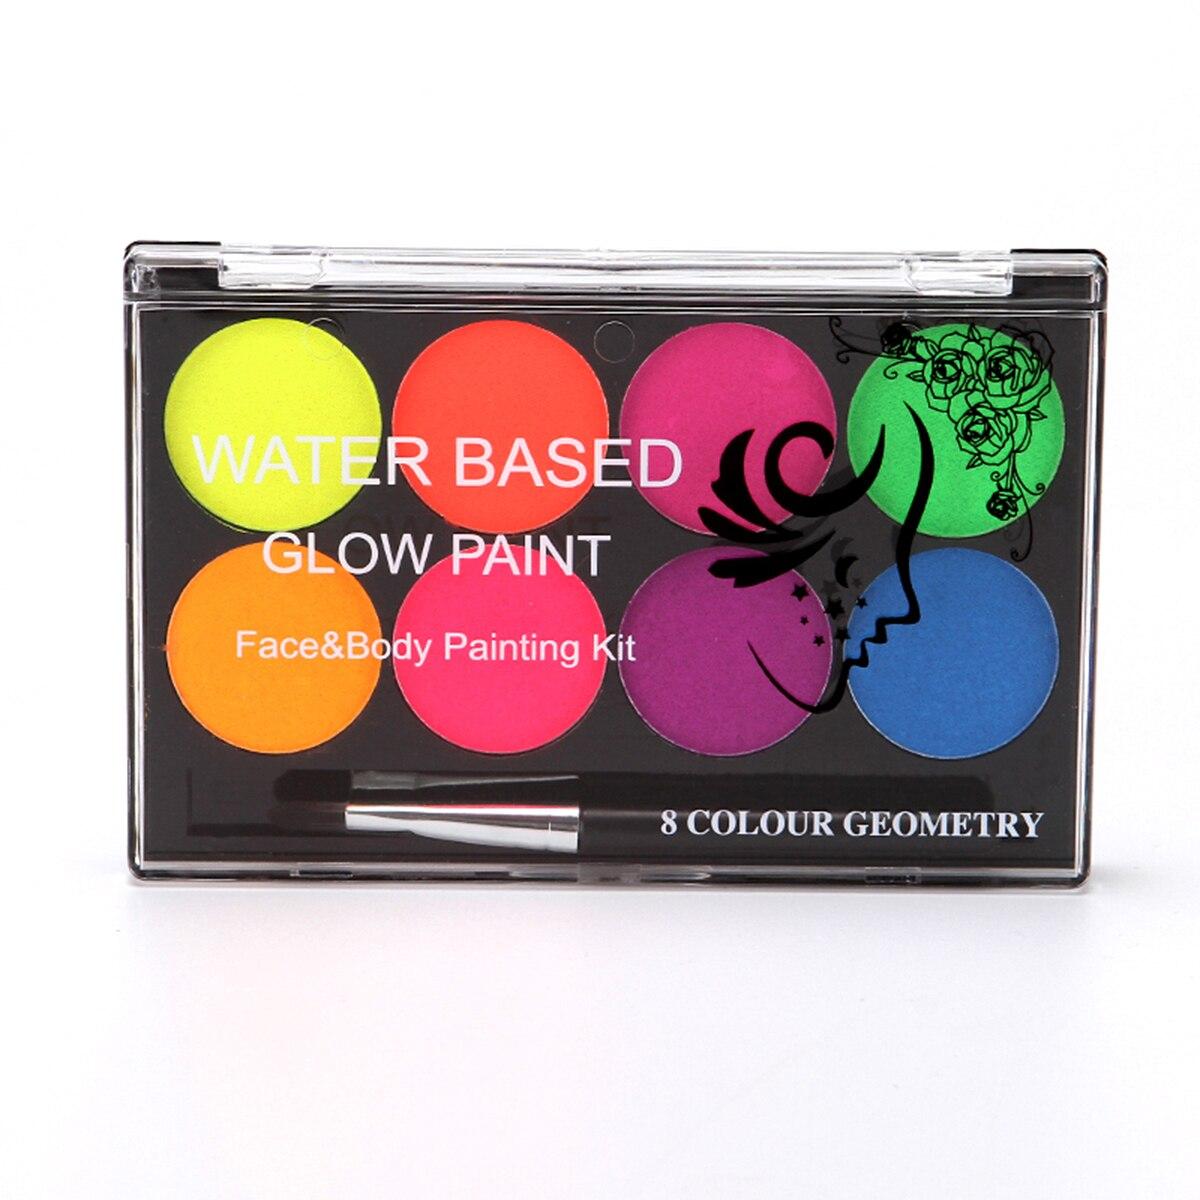 Kit de pintura corporal para rostro, pintura brillante profesional a base de agua, 8 colores con pincel de pintura, insípido para disfraz de fiesta de maquillaje